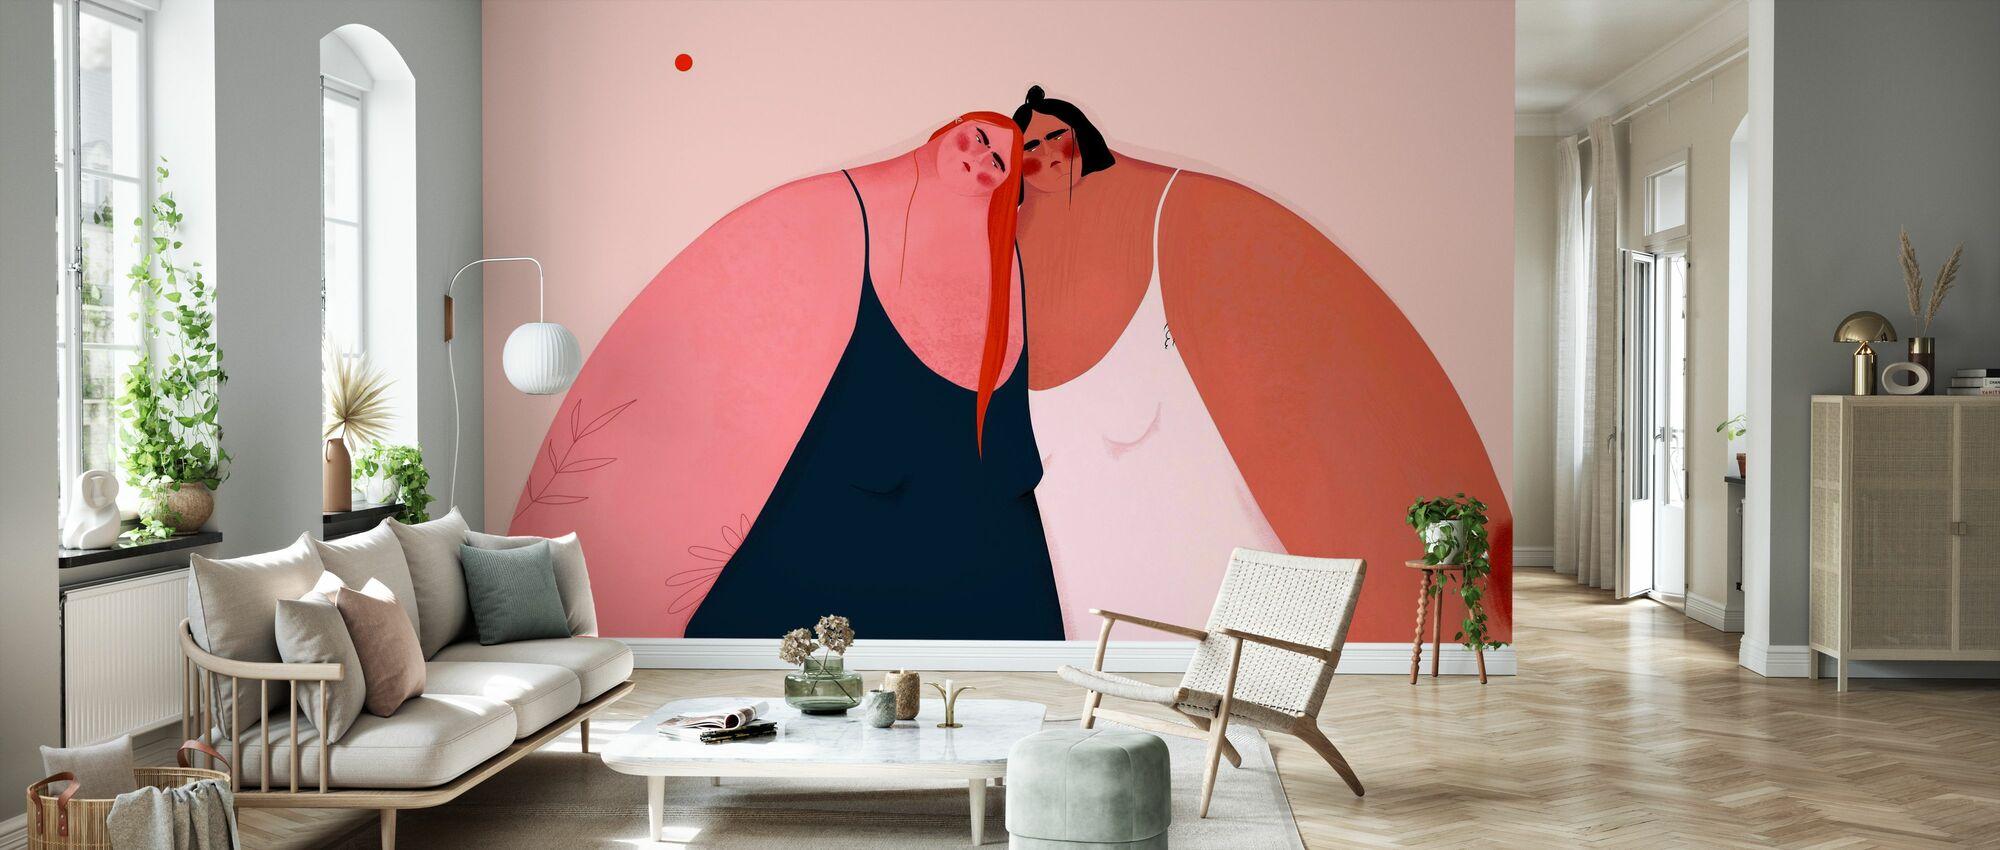 Friendship - Wallpaper - Living Room